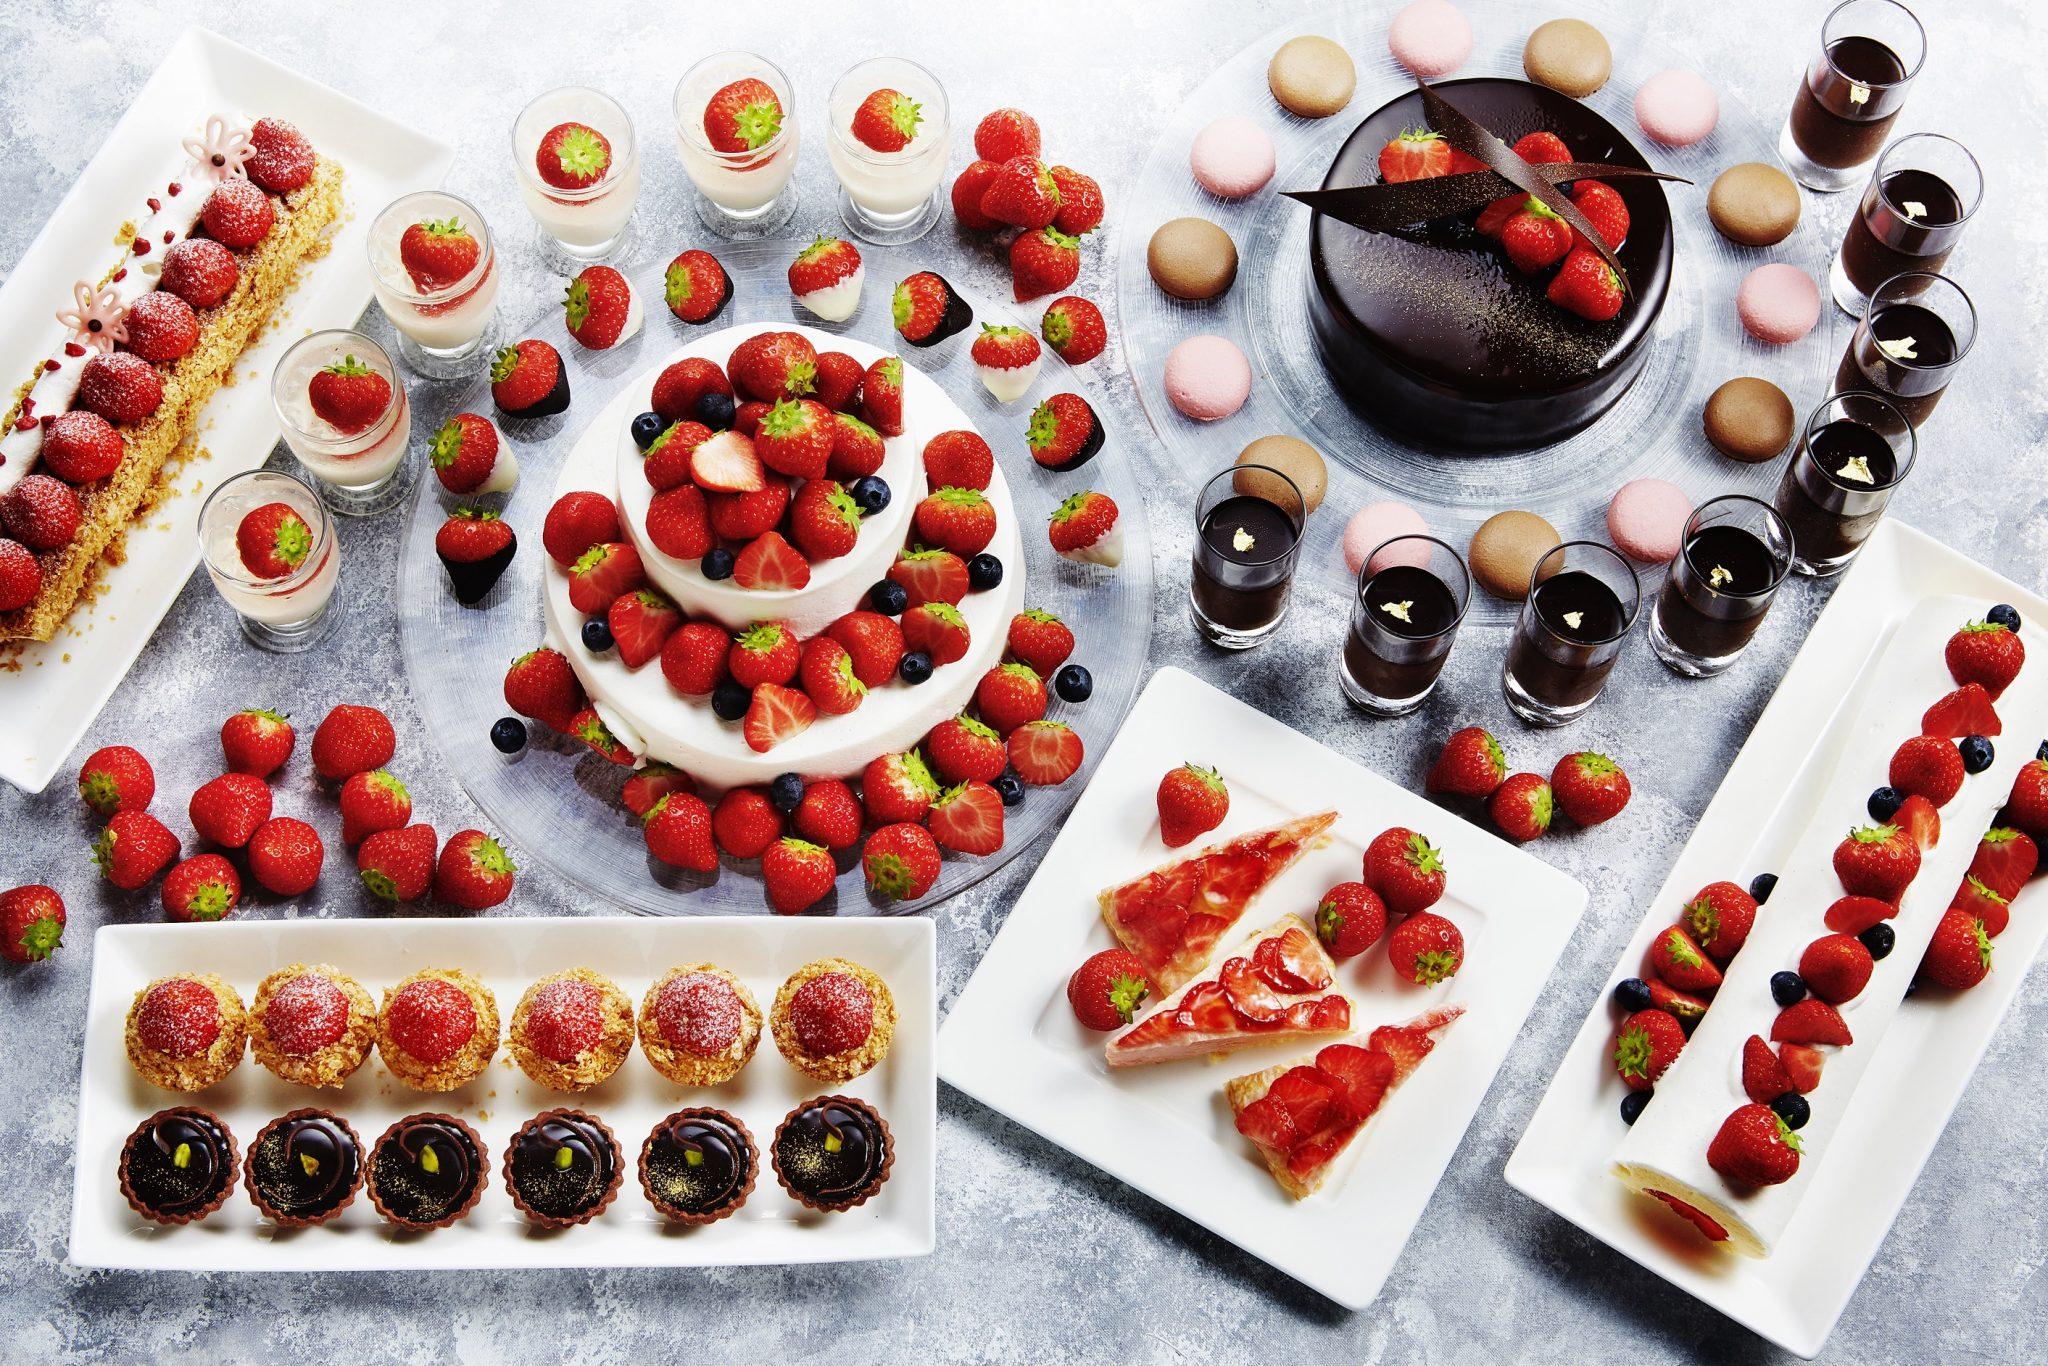 Spring Dessert Strawberry and Chocolate Buffet